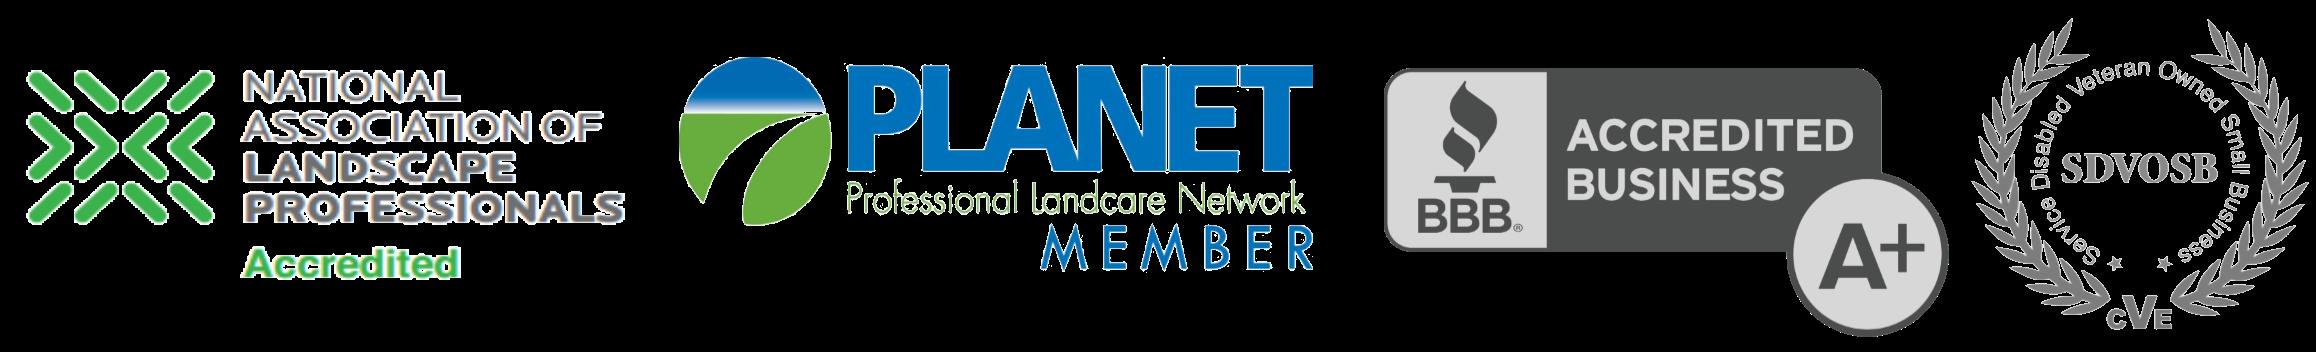 membership and affiliation logos